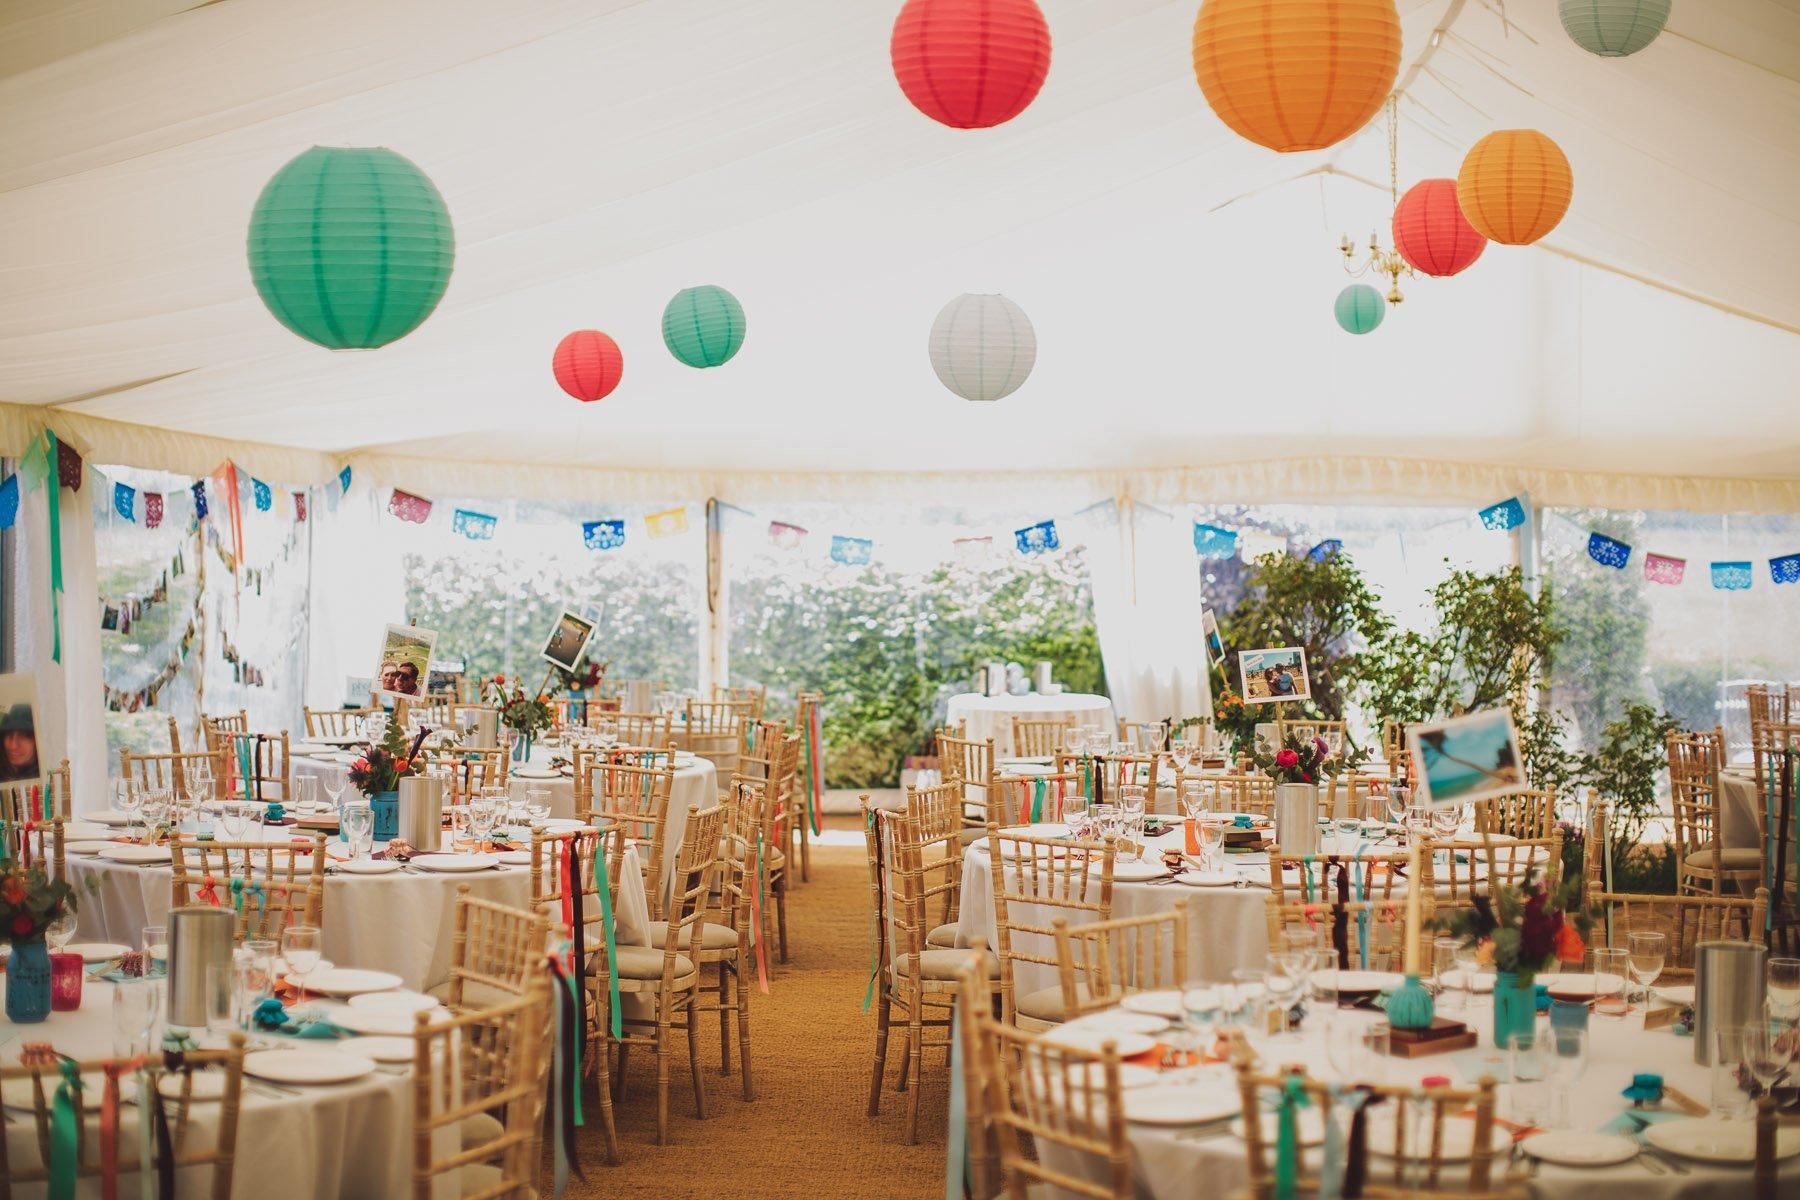 Buckinghamshire-Wedding-Lizzie-Duncan-022